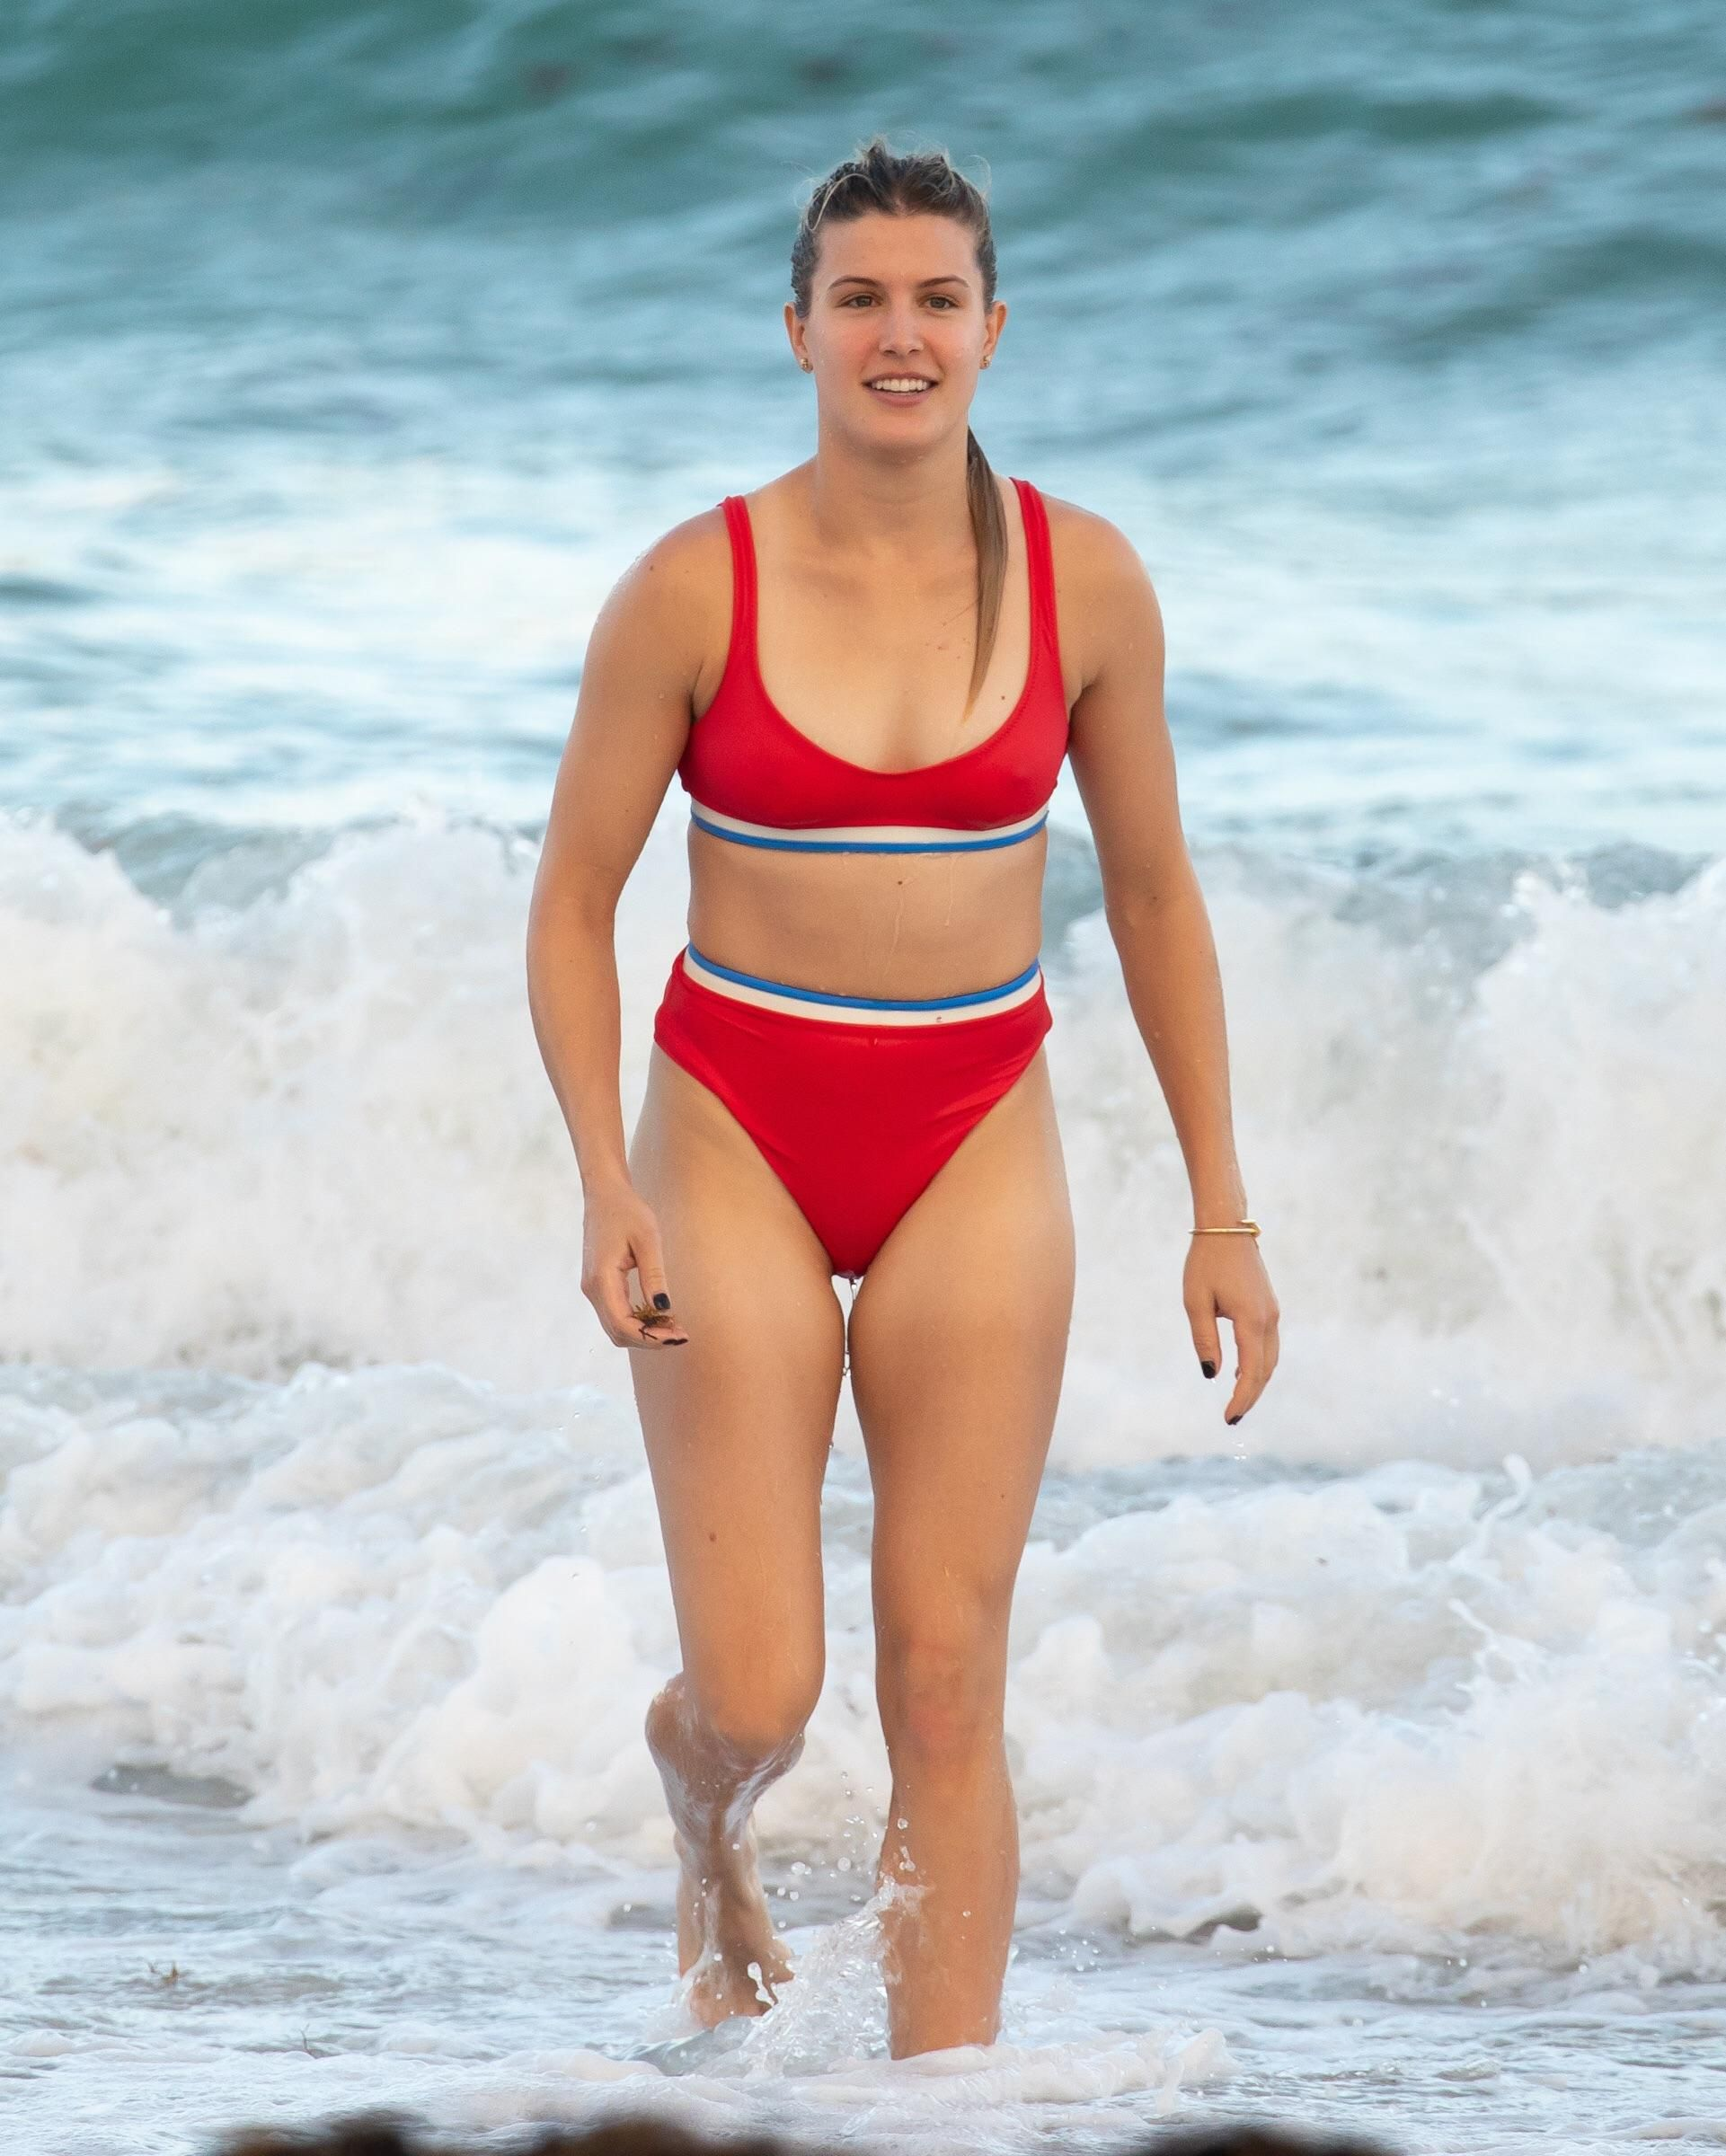 Bikini Eugenie Bouchard nude (91 photos), Tits, Fappening, Feet, braless 2018